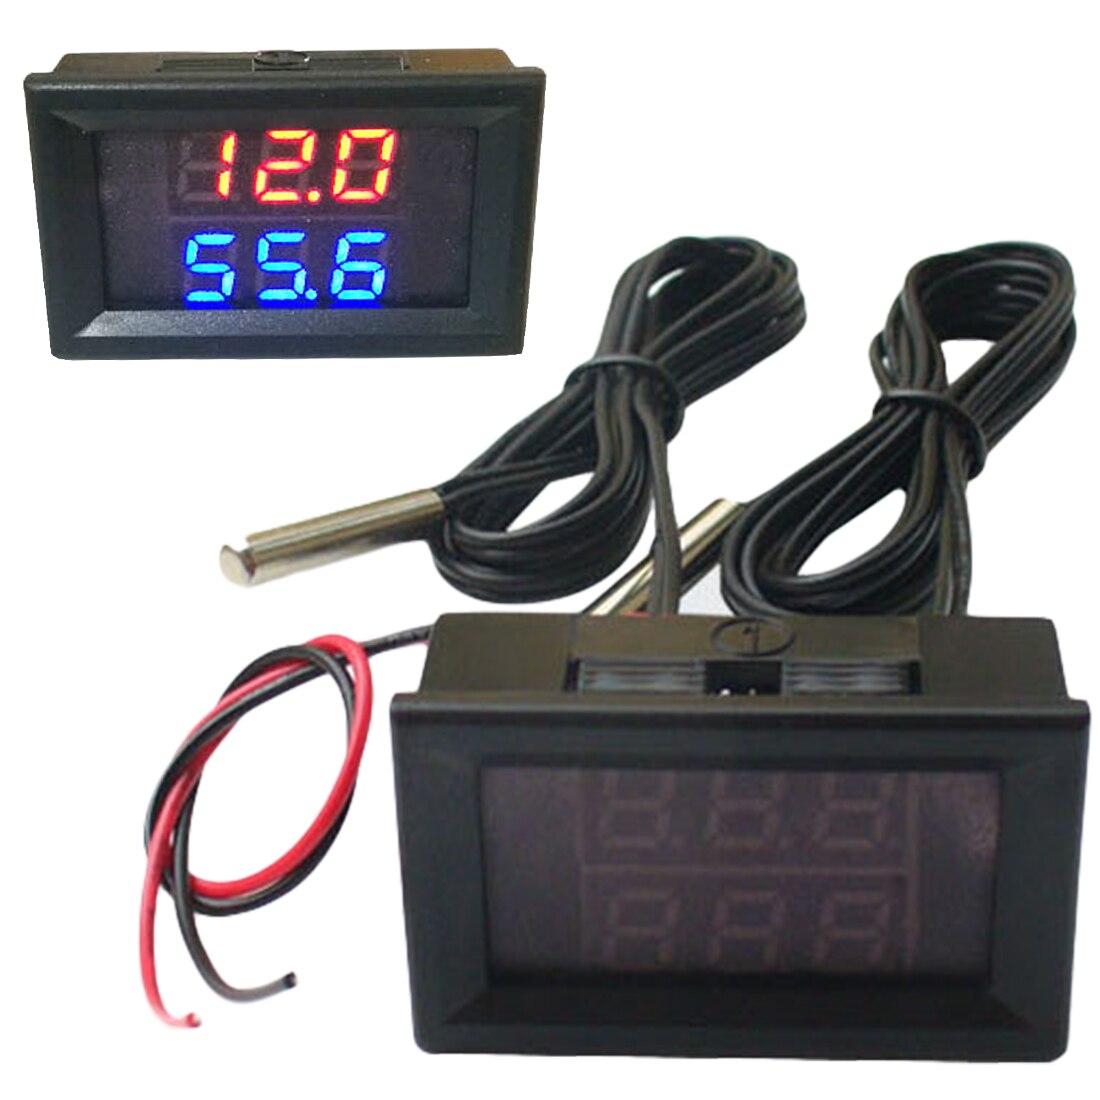 -50-120c Digitale Einstellbare Temperatur Controller Mini Mikrocomputer Thermostat Regler Dc 4-28 V